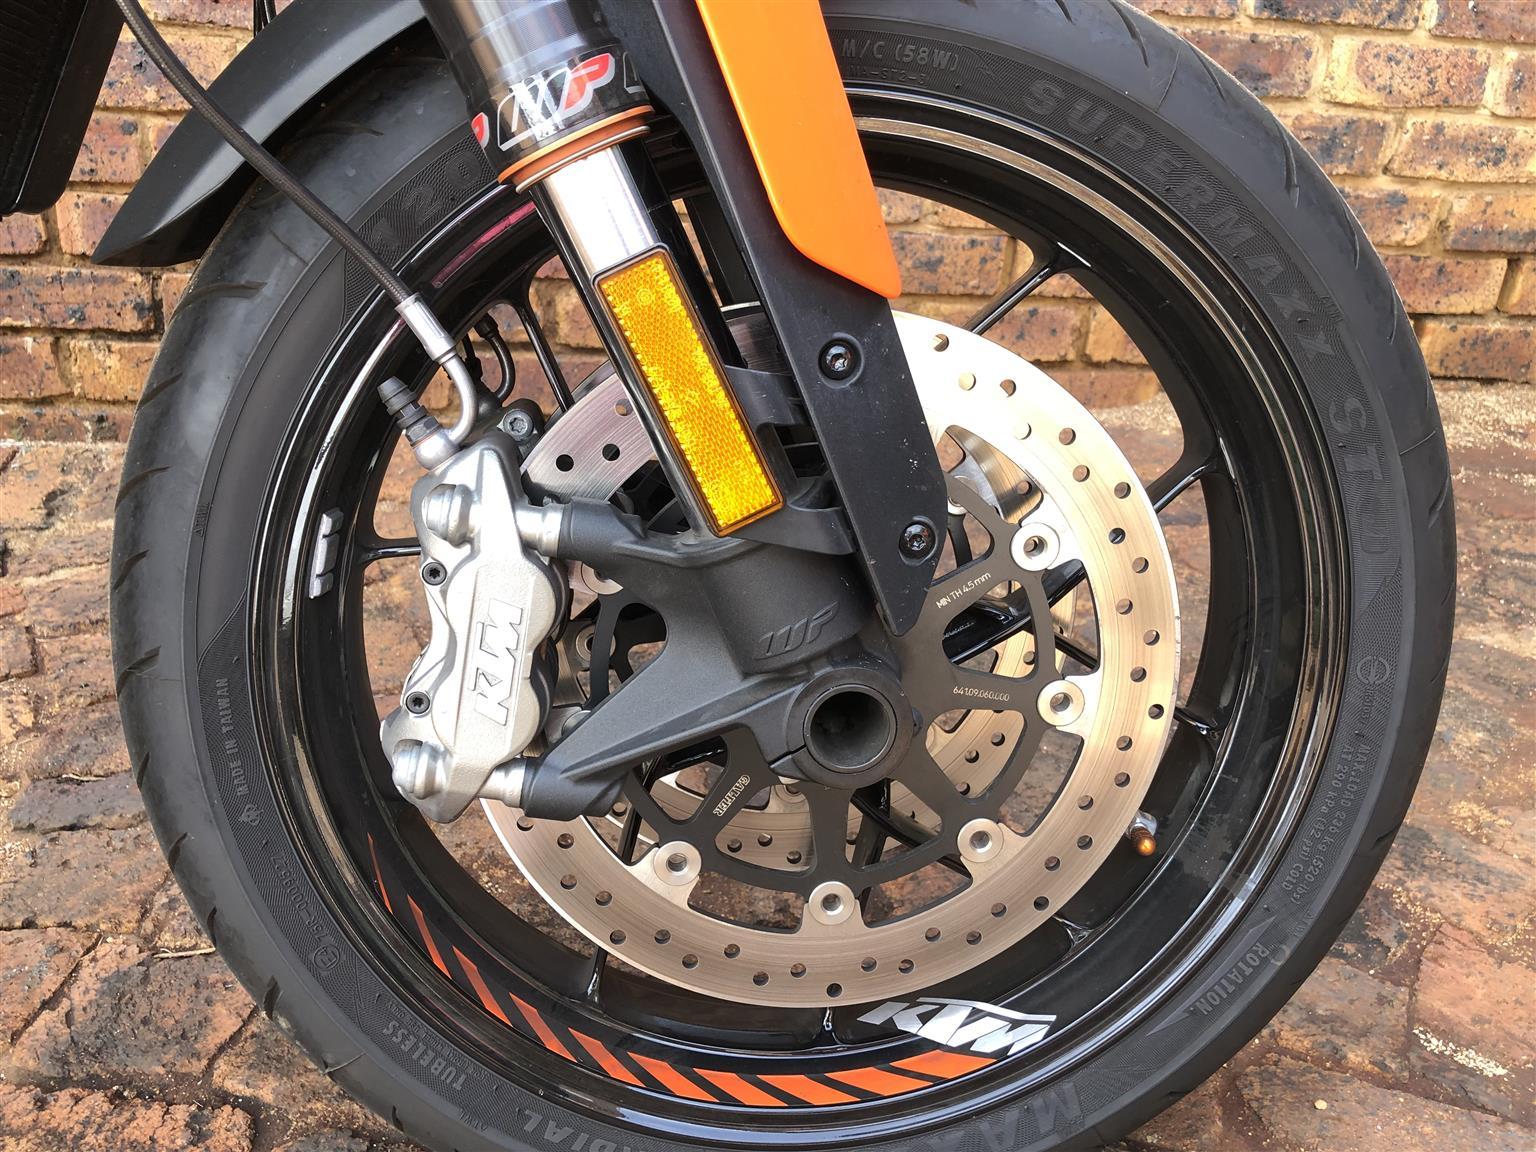 2018 KTM Duke 790 - Great Condition - Neg